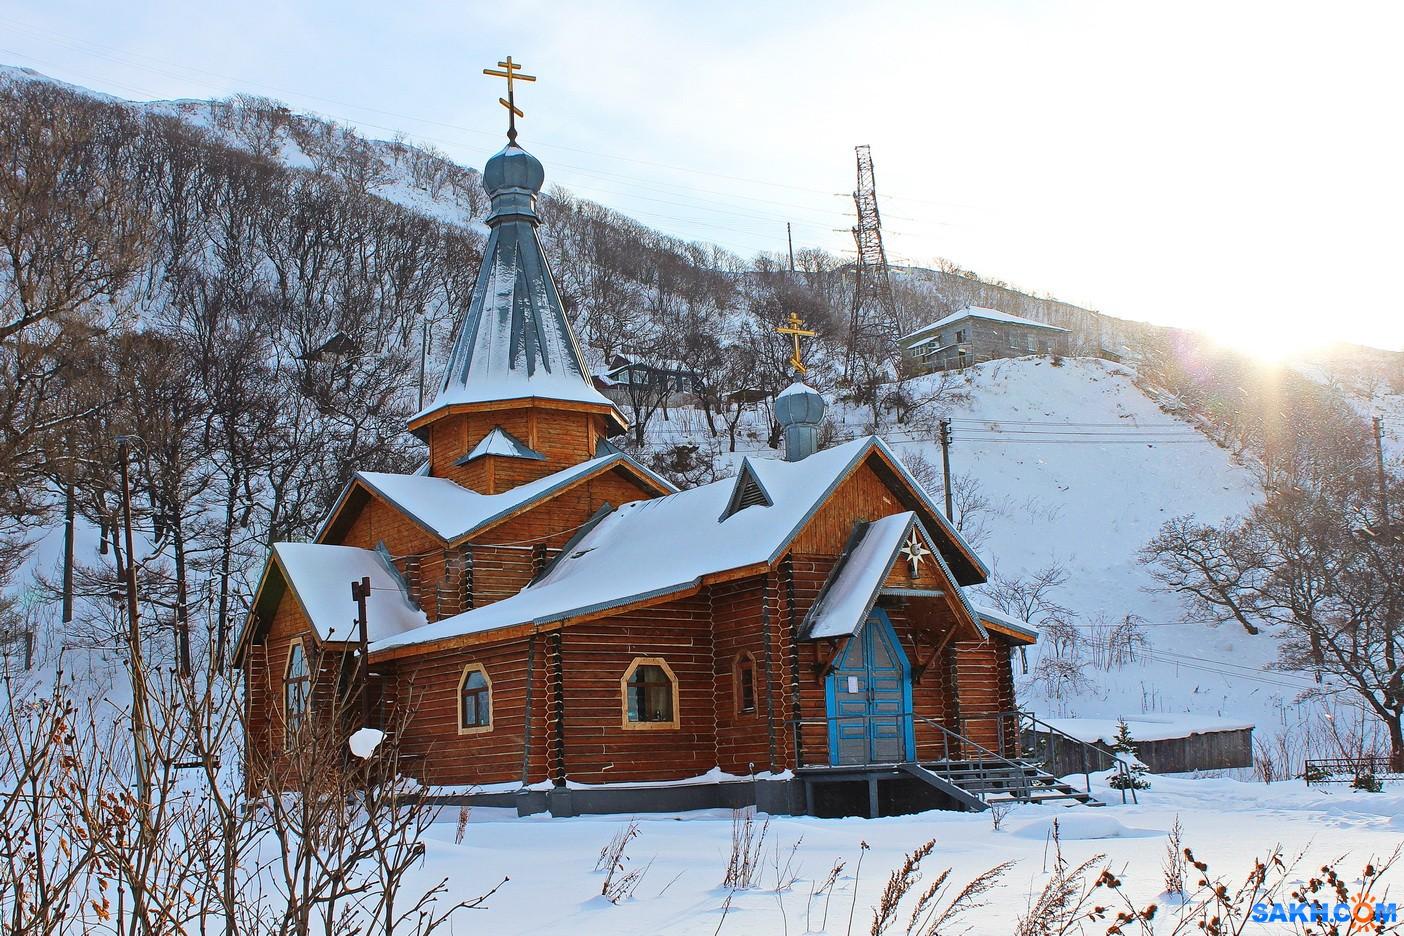 7388PetVladVik: Храм в Невельске.